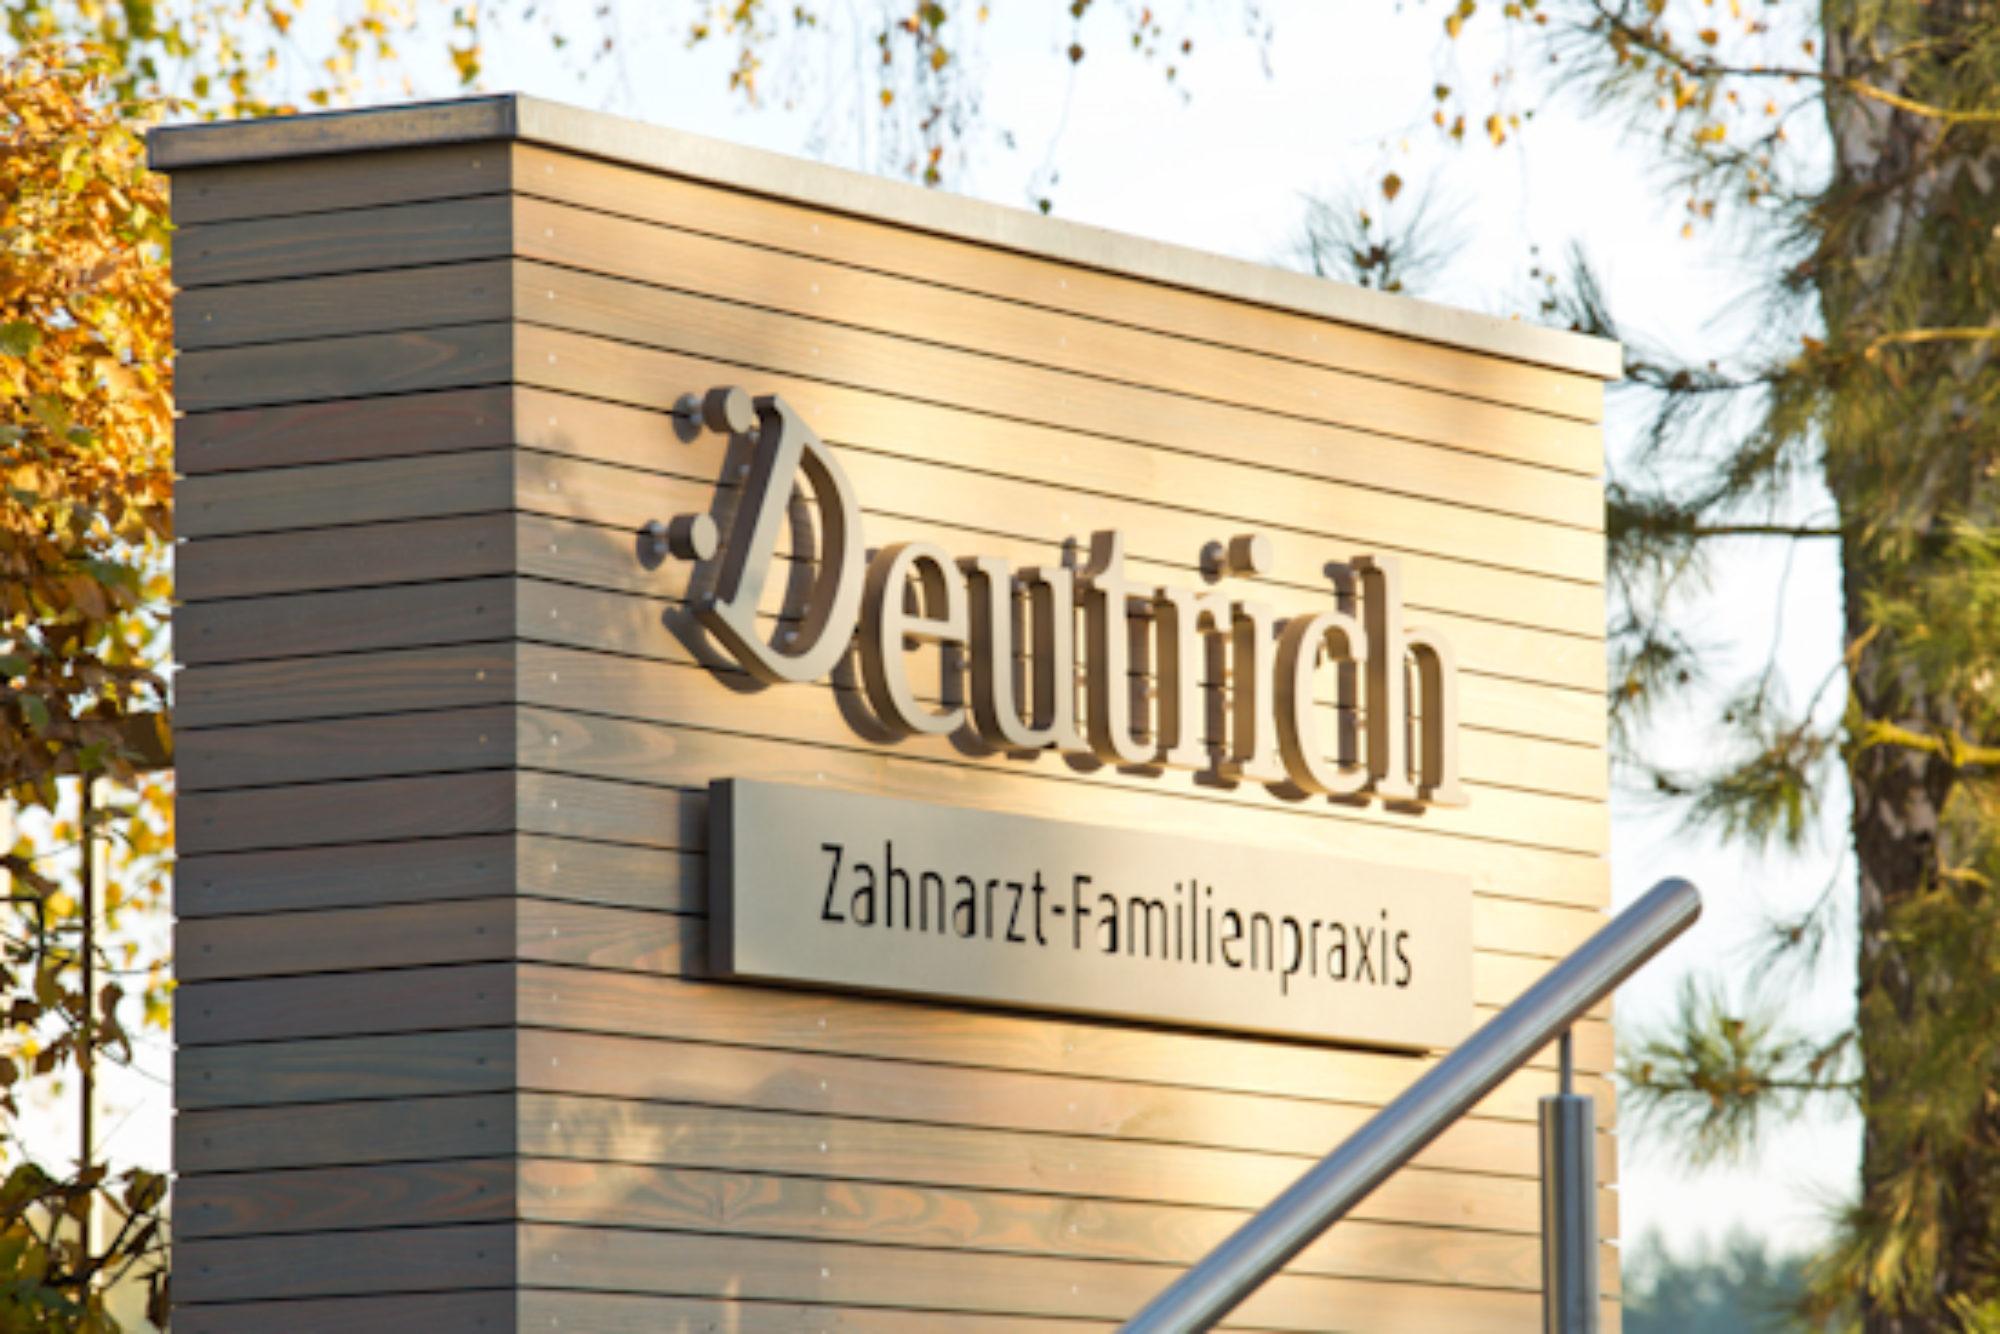 :Deutrich Zahnarzt-Familienpraxis